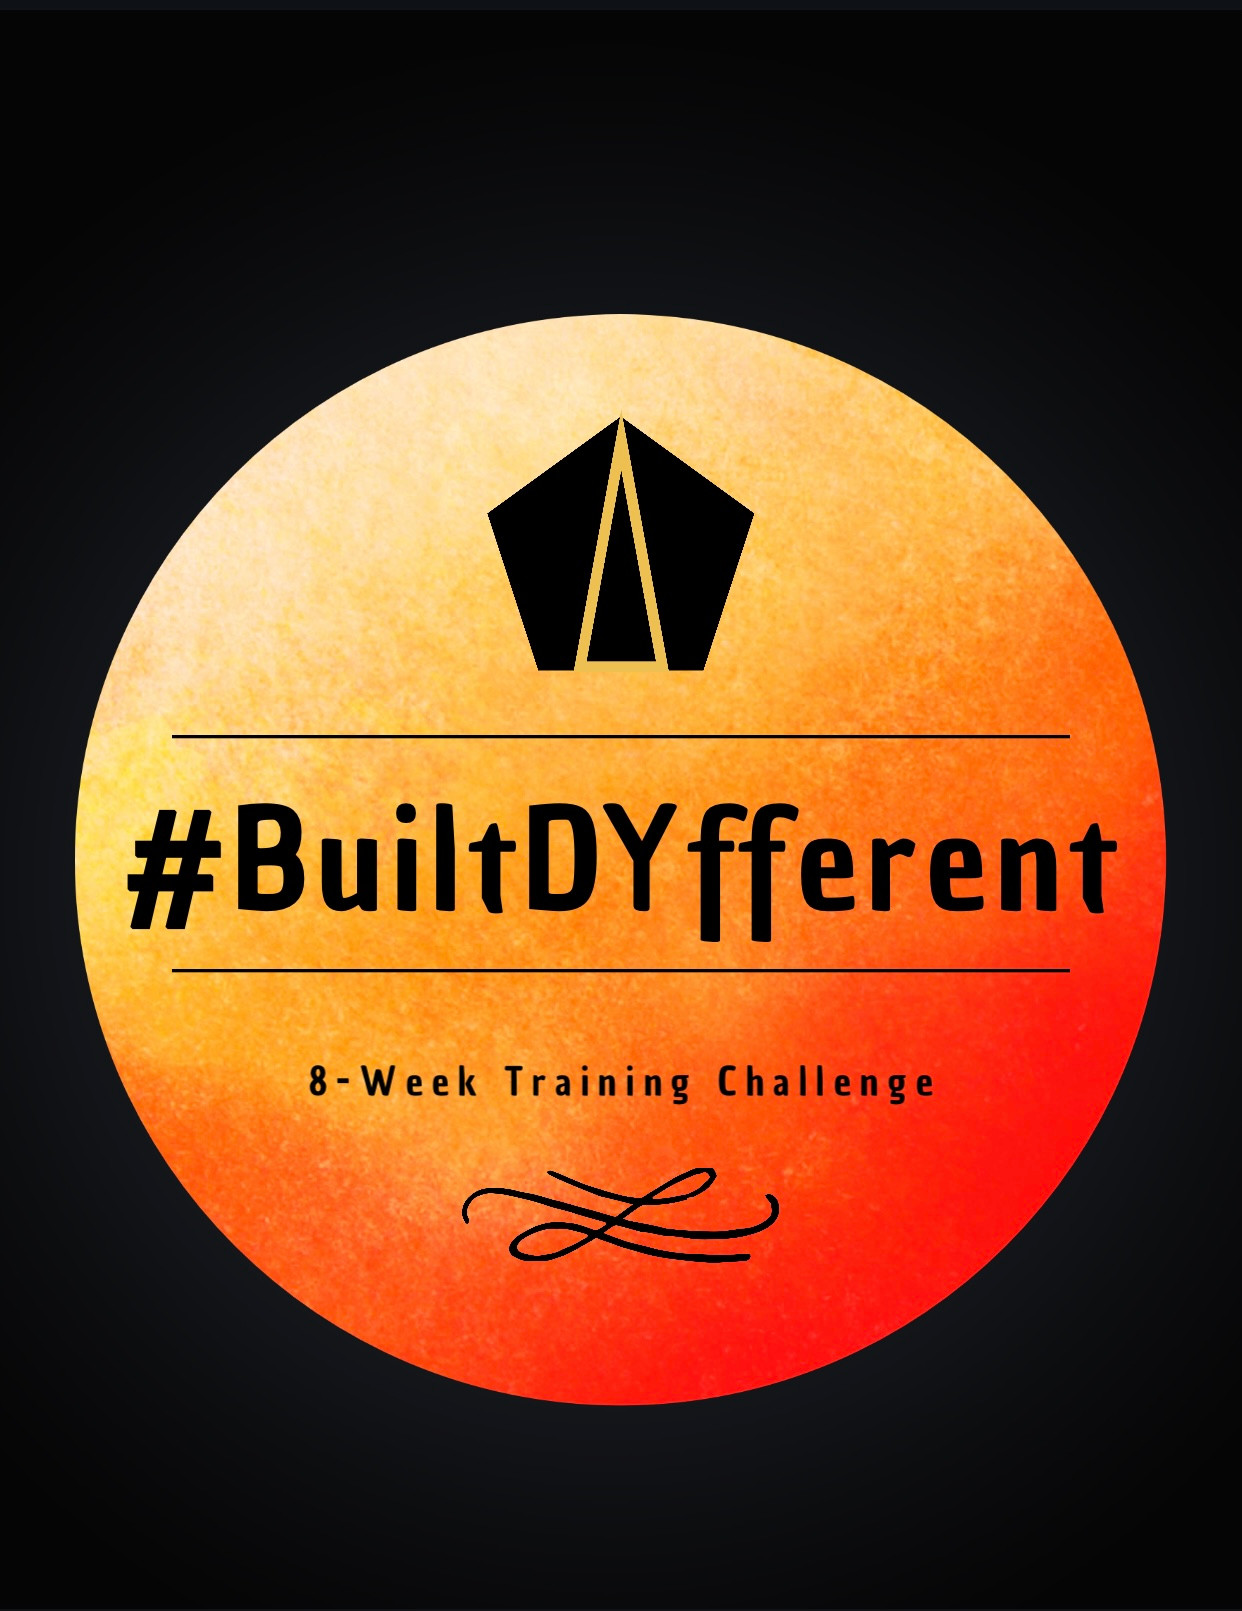 #BuiltDYfferent 8-Week Training